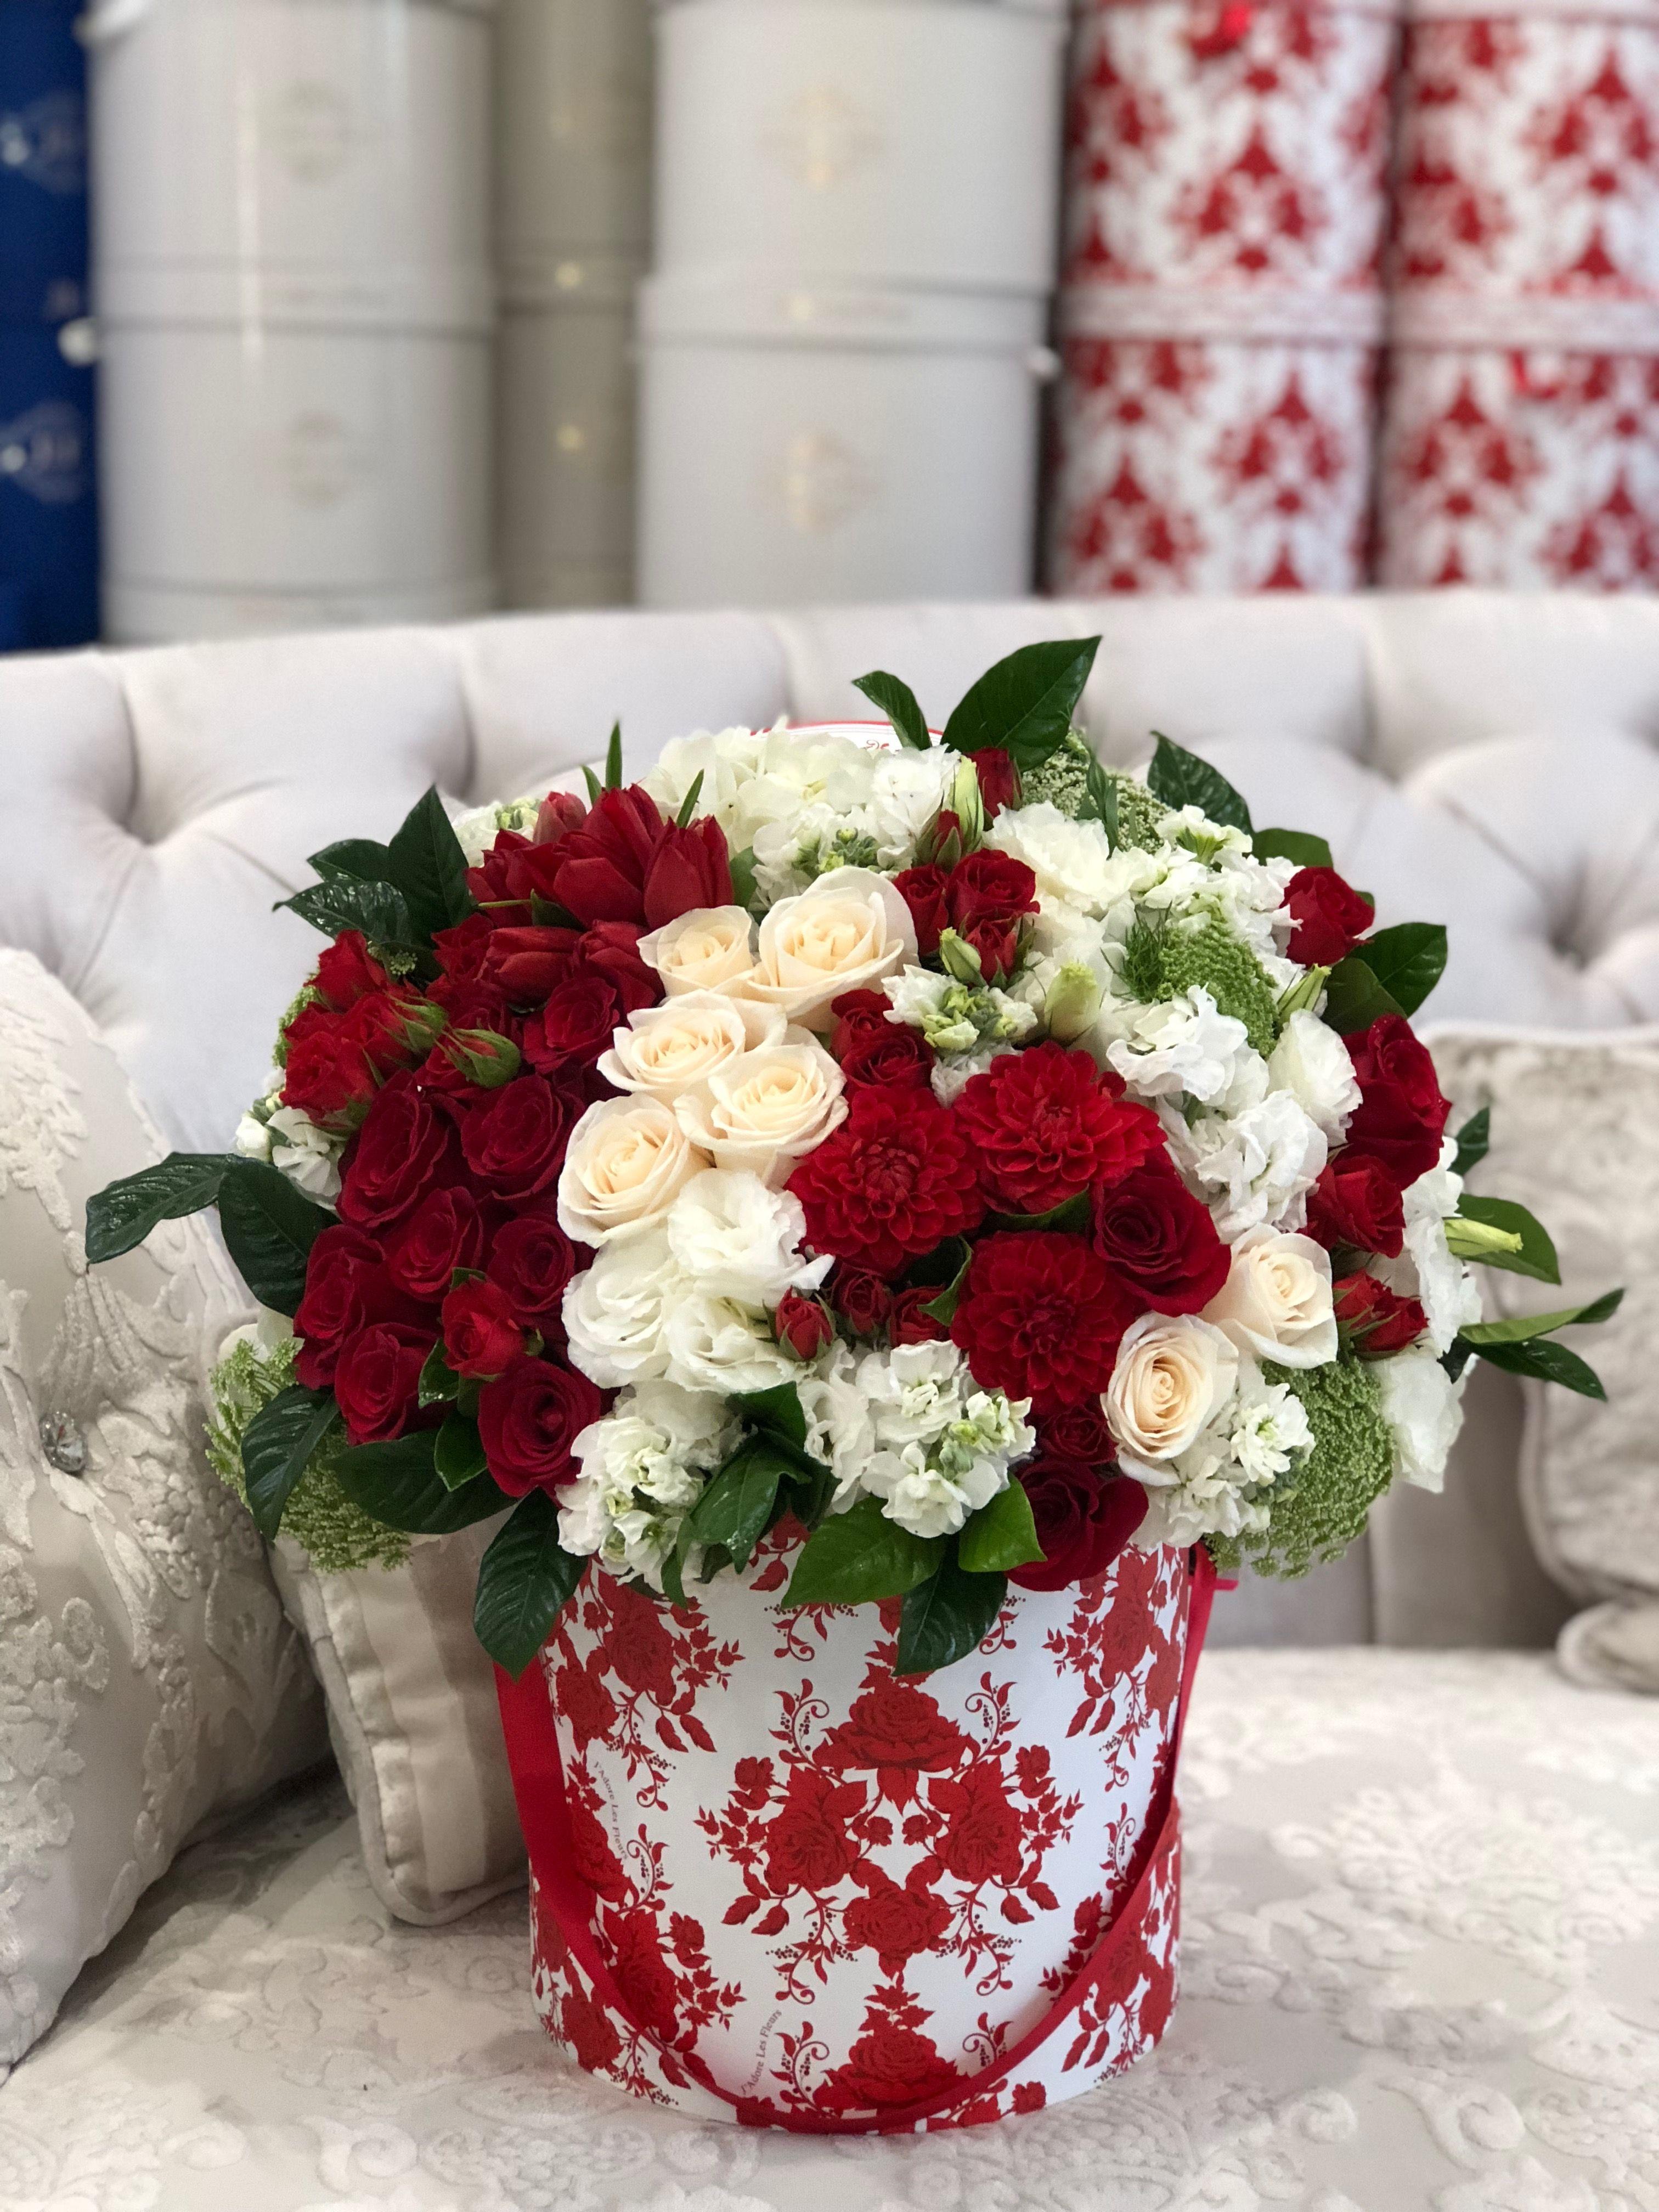 Celebrate Valentine's Day with this exquisite arrangement